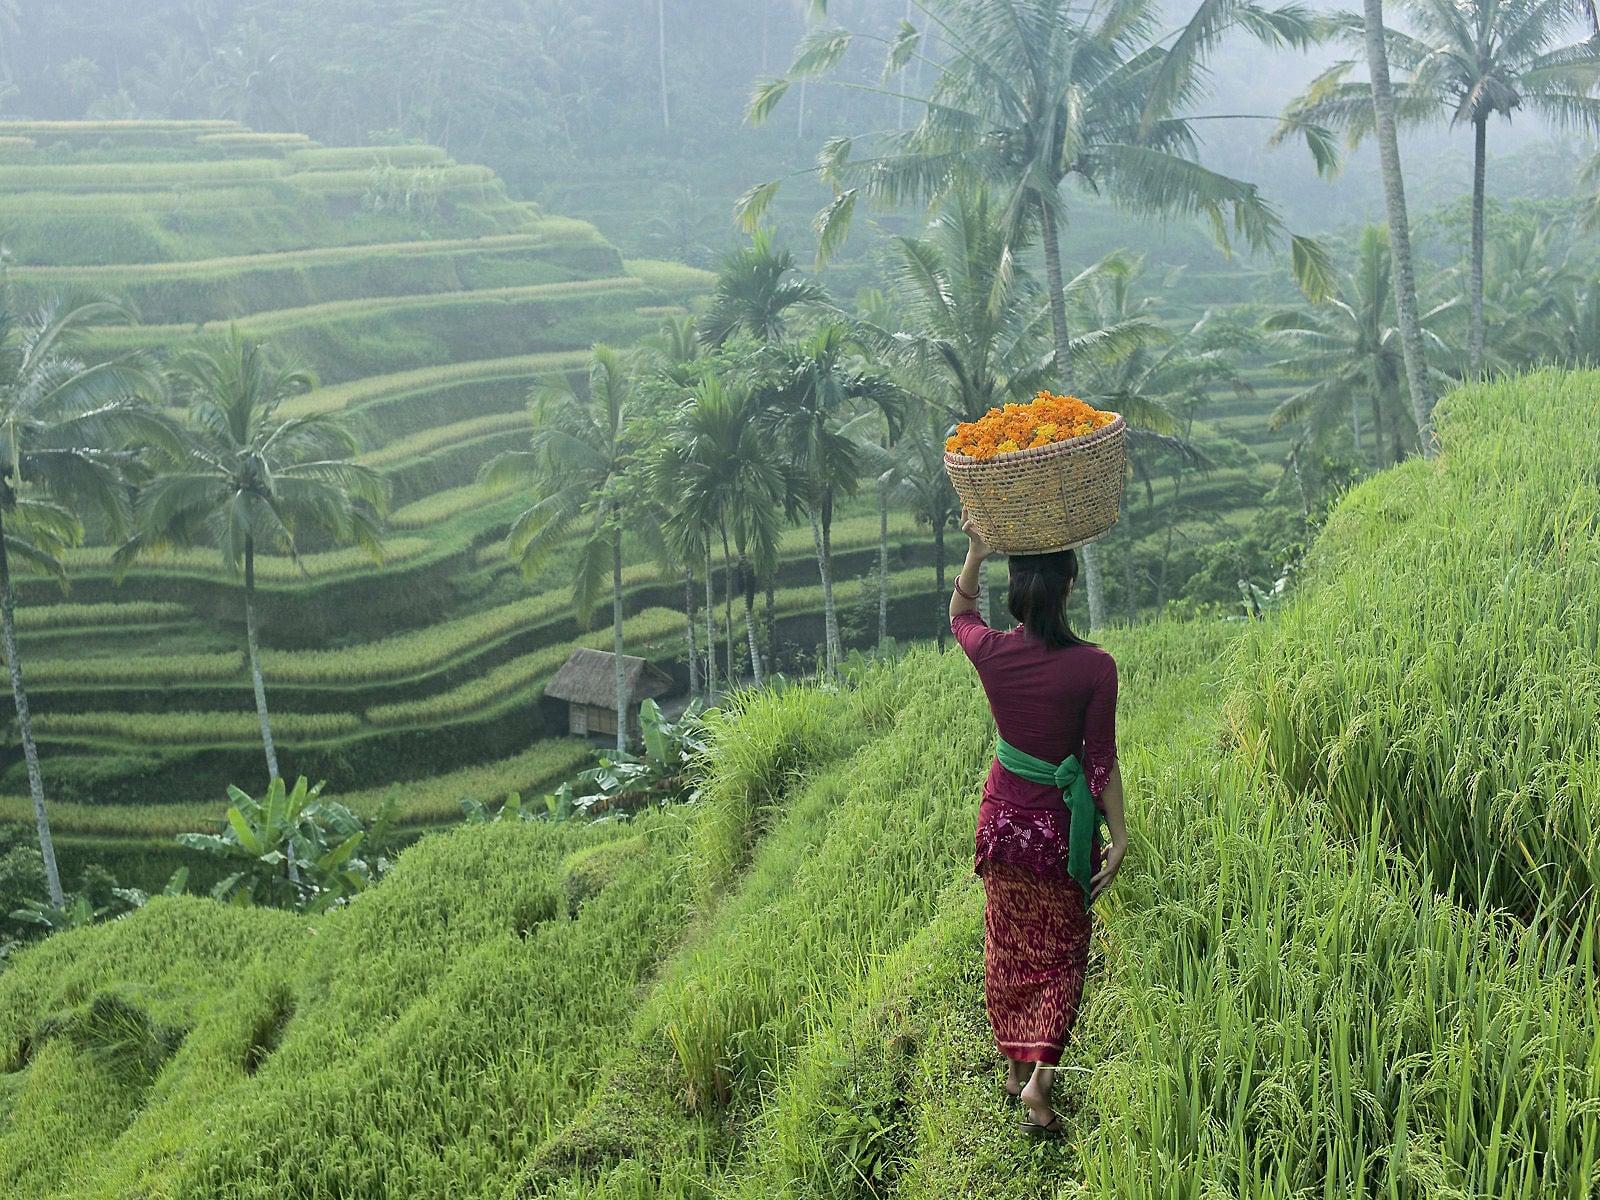 rondreis bali belimbing sawas rijstvelden blog